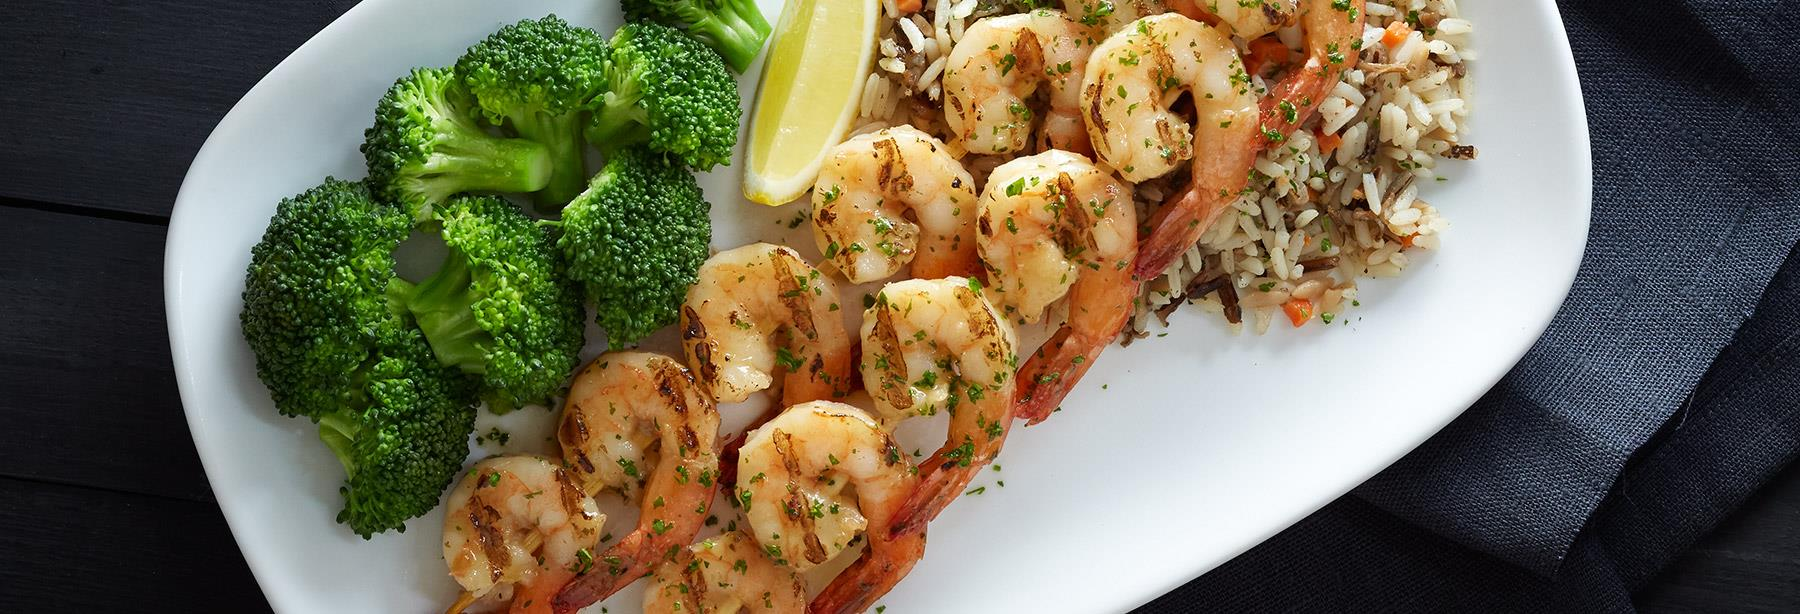 Grilled Shrimp Restaurant Near Me